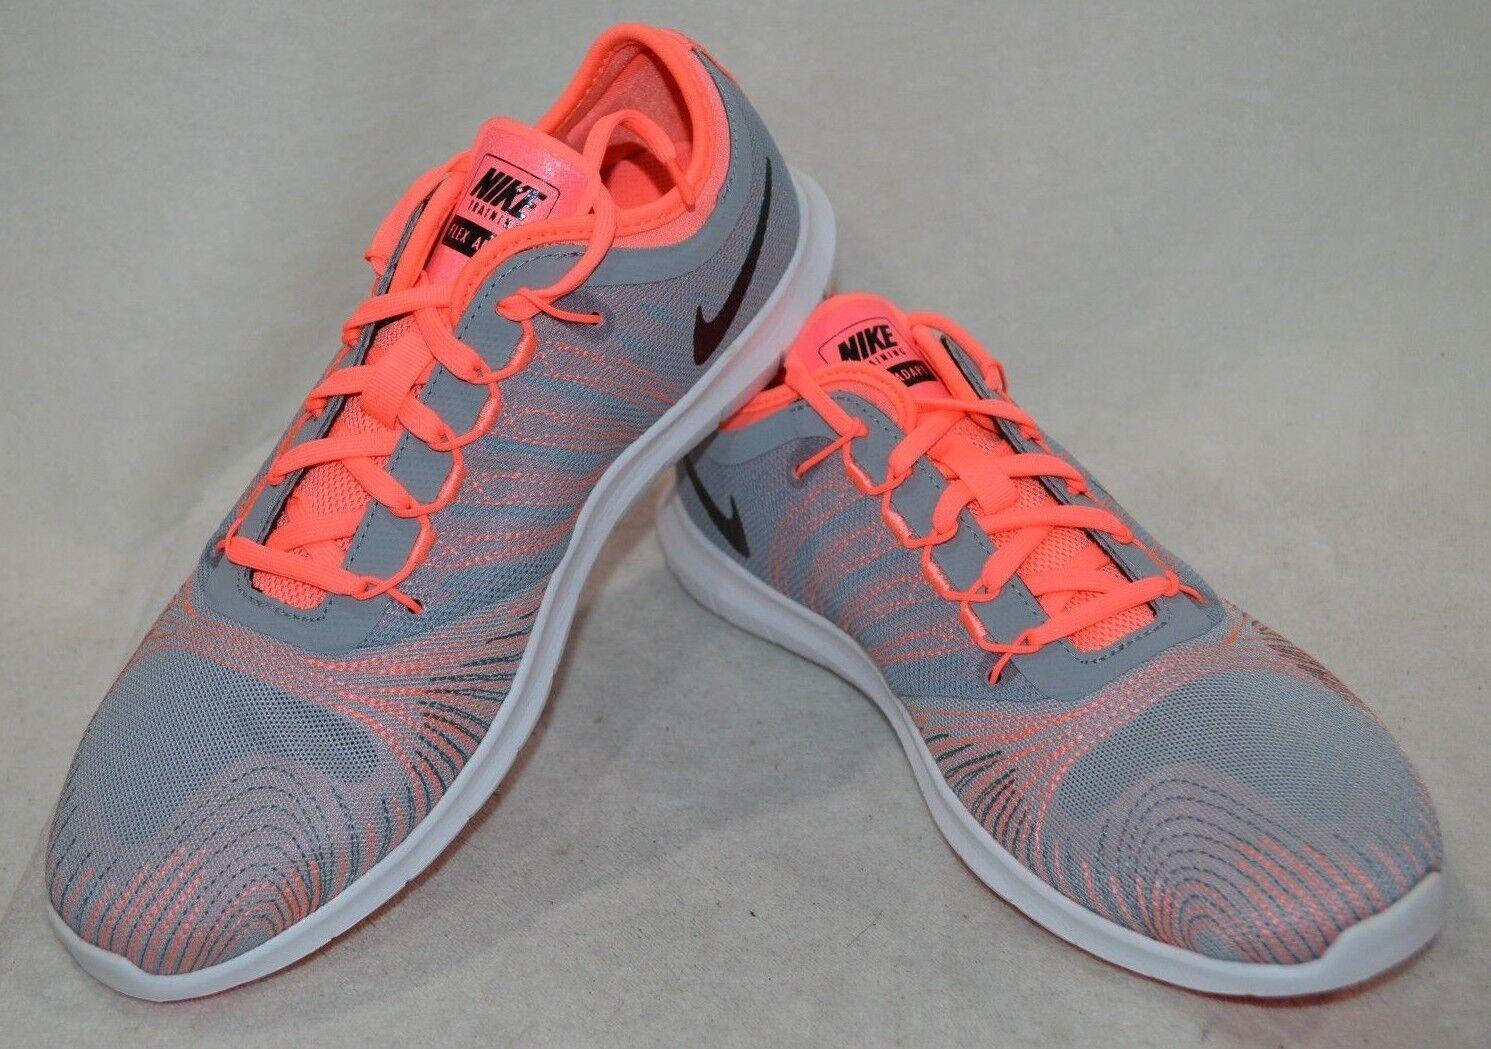 Nike Flex Adapt TR Grey/Black/Lava Glow Women's Training NWB Shoes - Asst Sizes NWB Training f41898